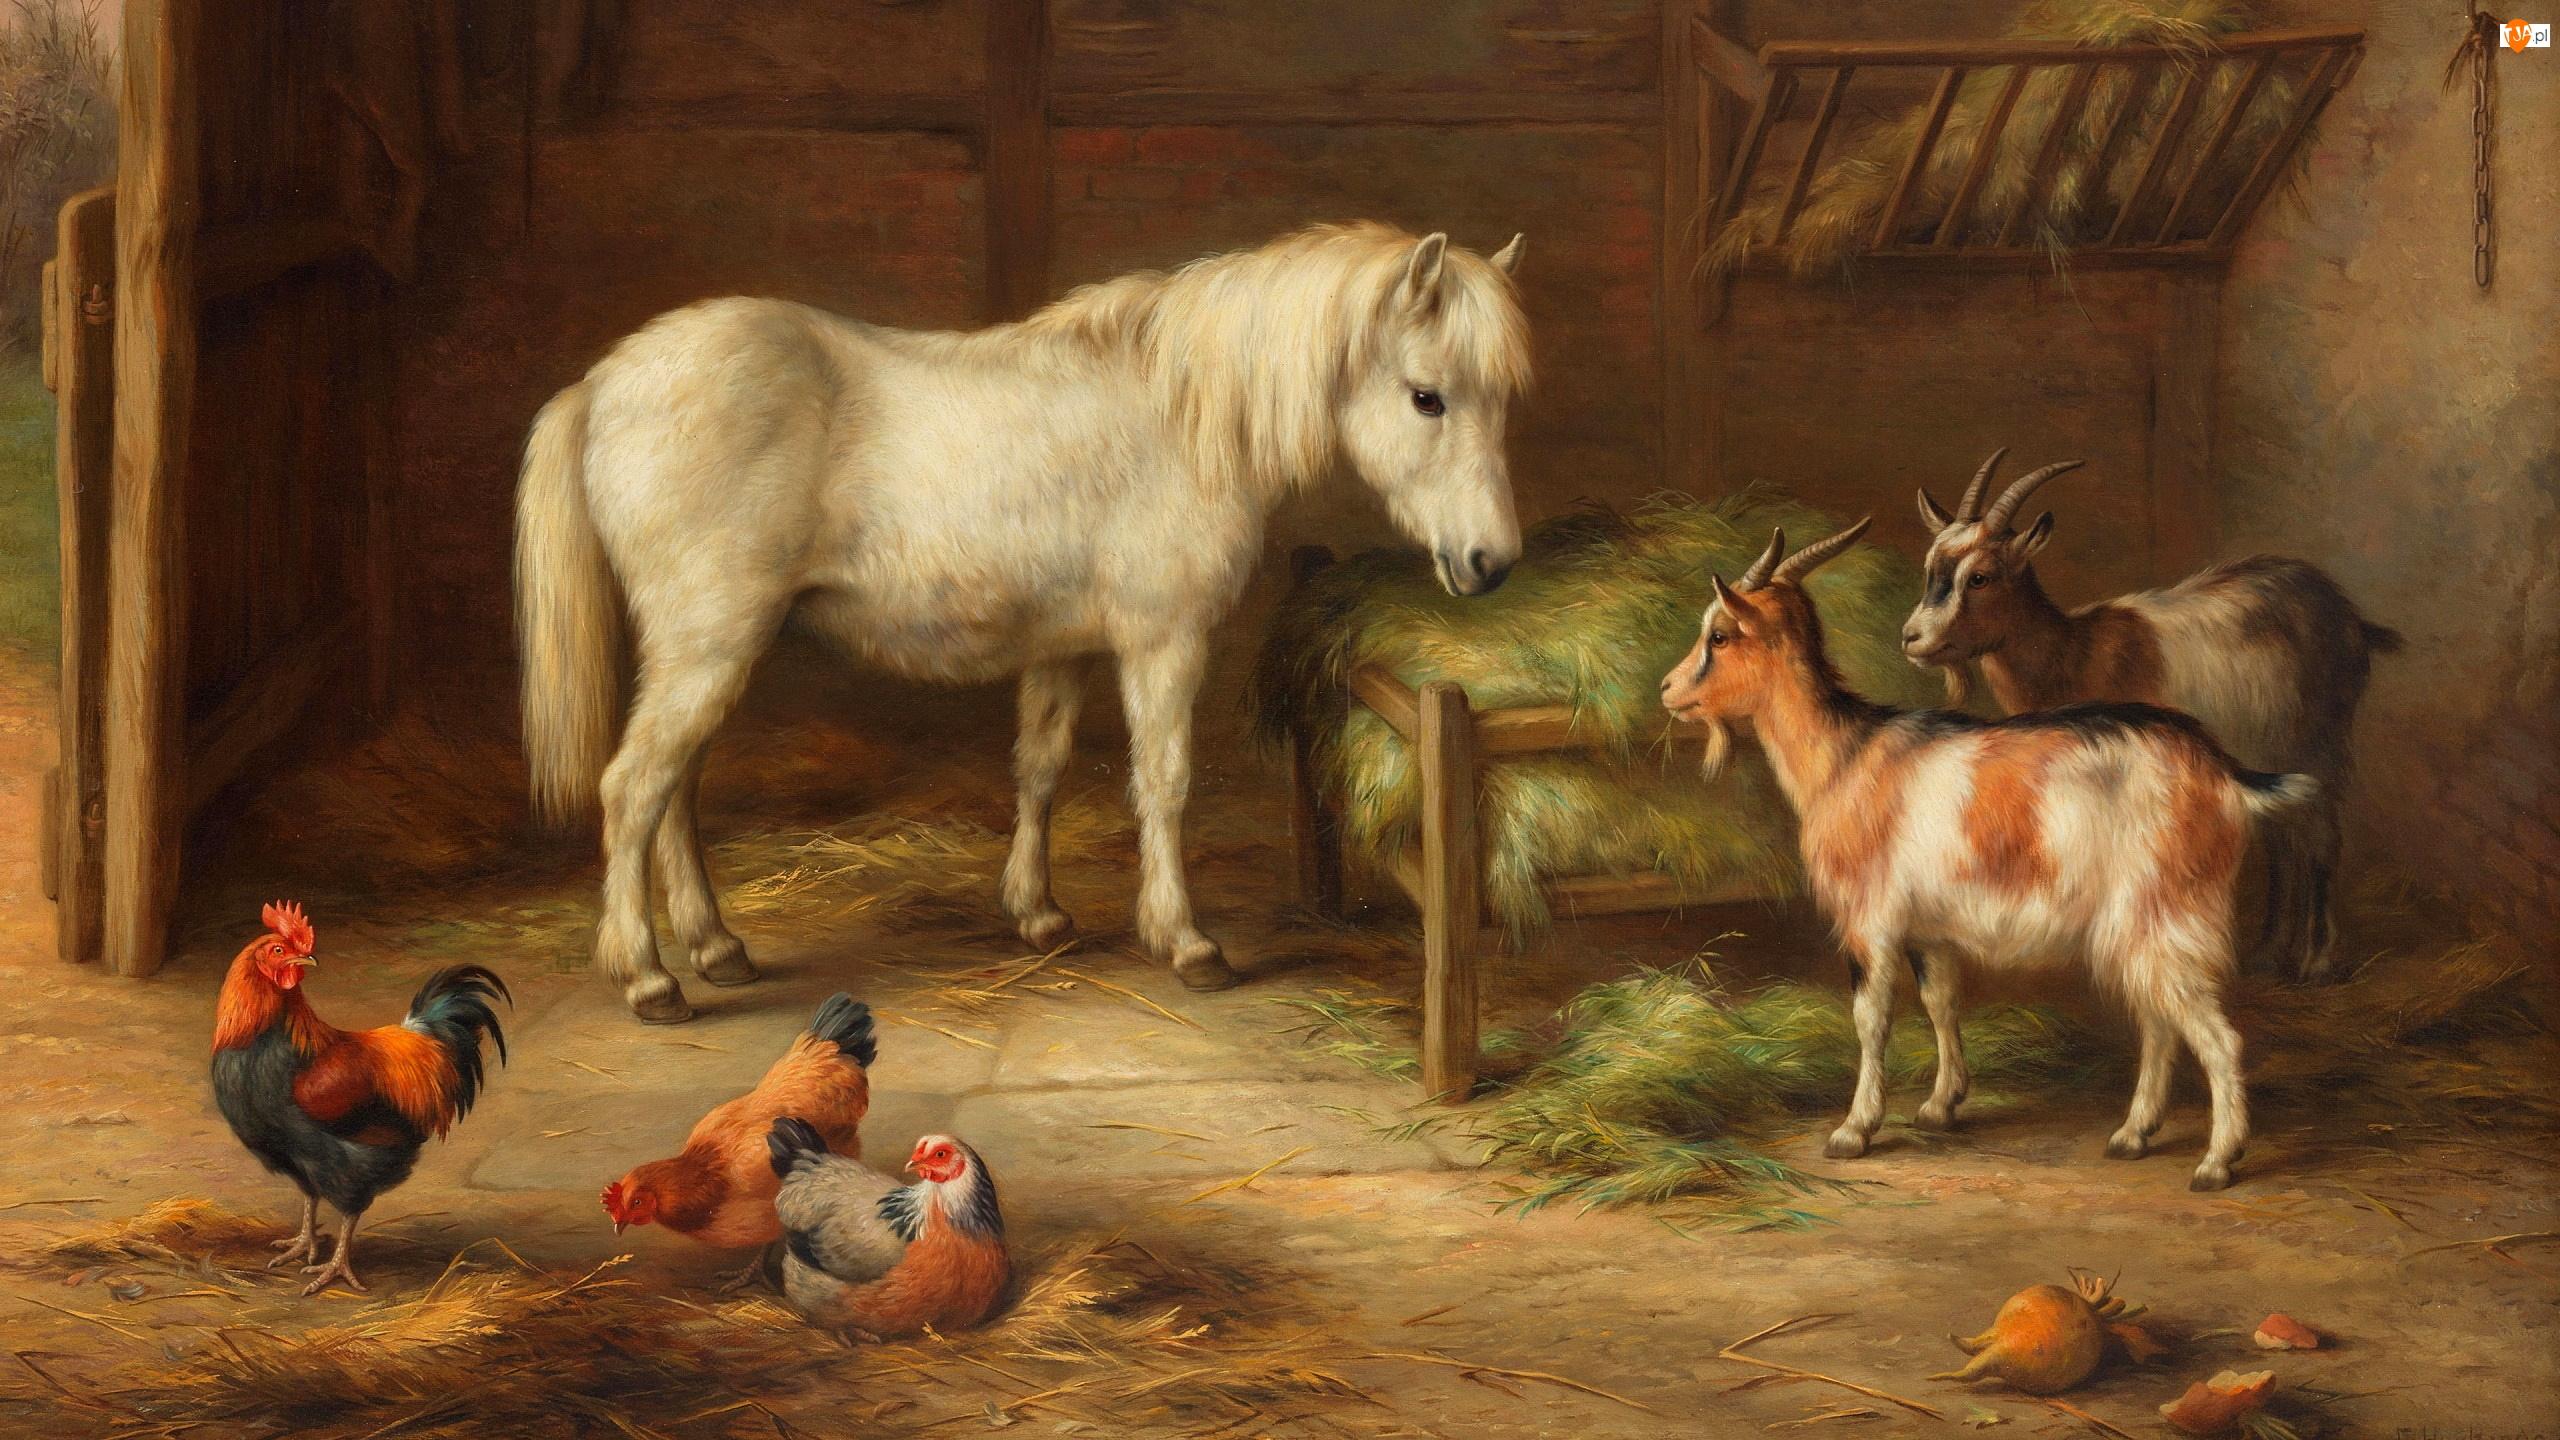 Obraz, Edgar Hunt, Stodoła, Malarstwo, Kury, Kozy, Koń